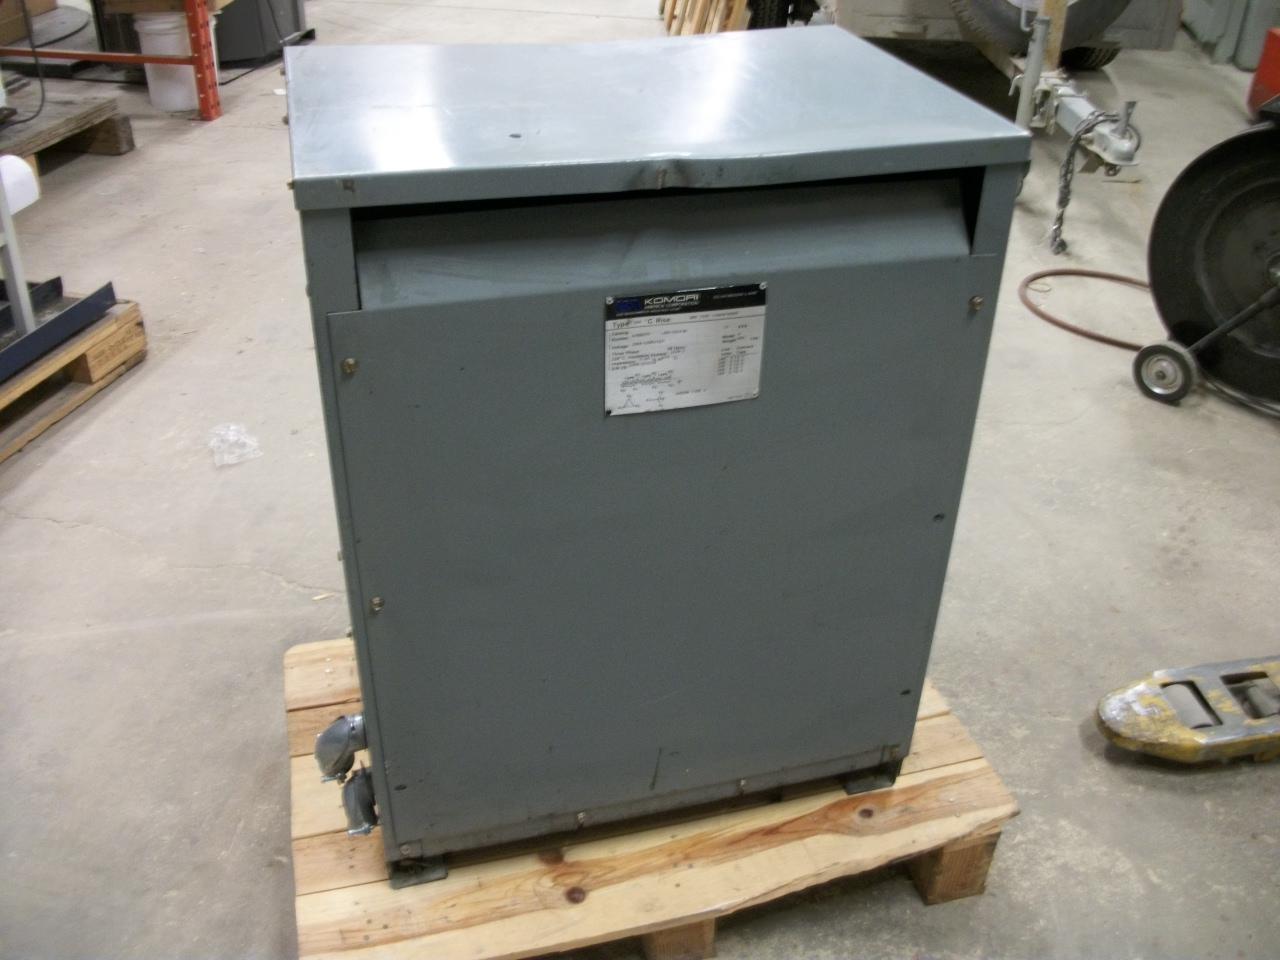 Lot 52 3 Phase Transformer 208 240 To 480 600 Volt 75kva